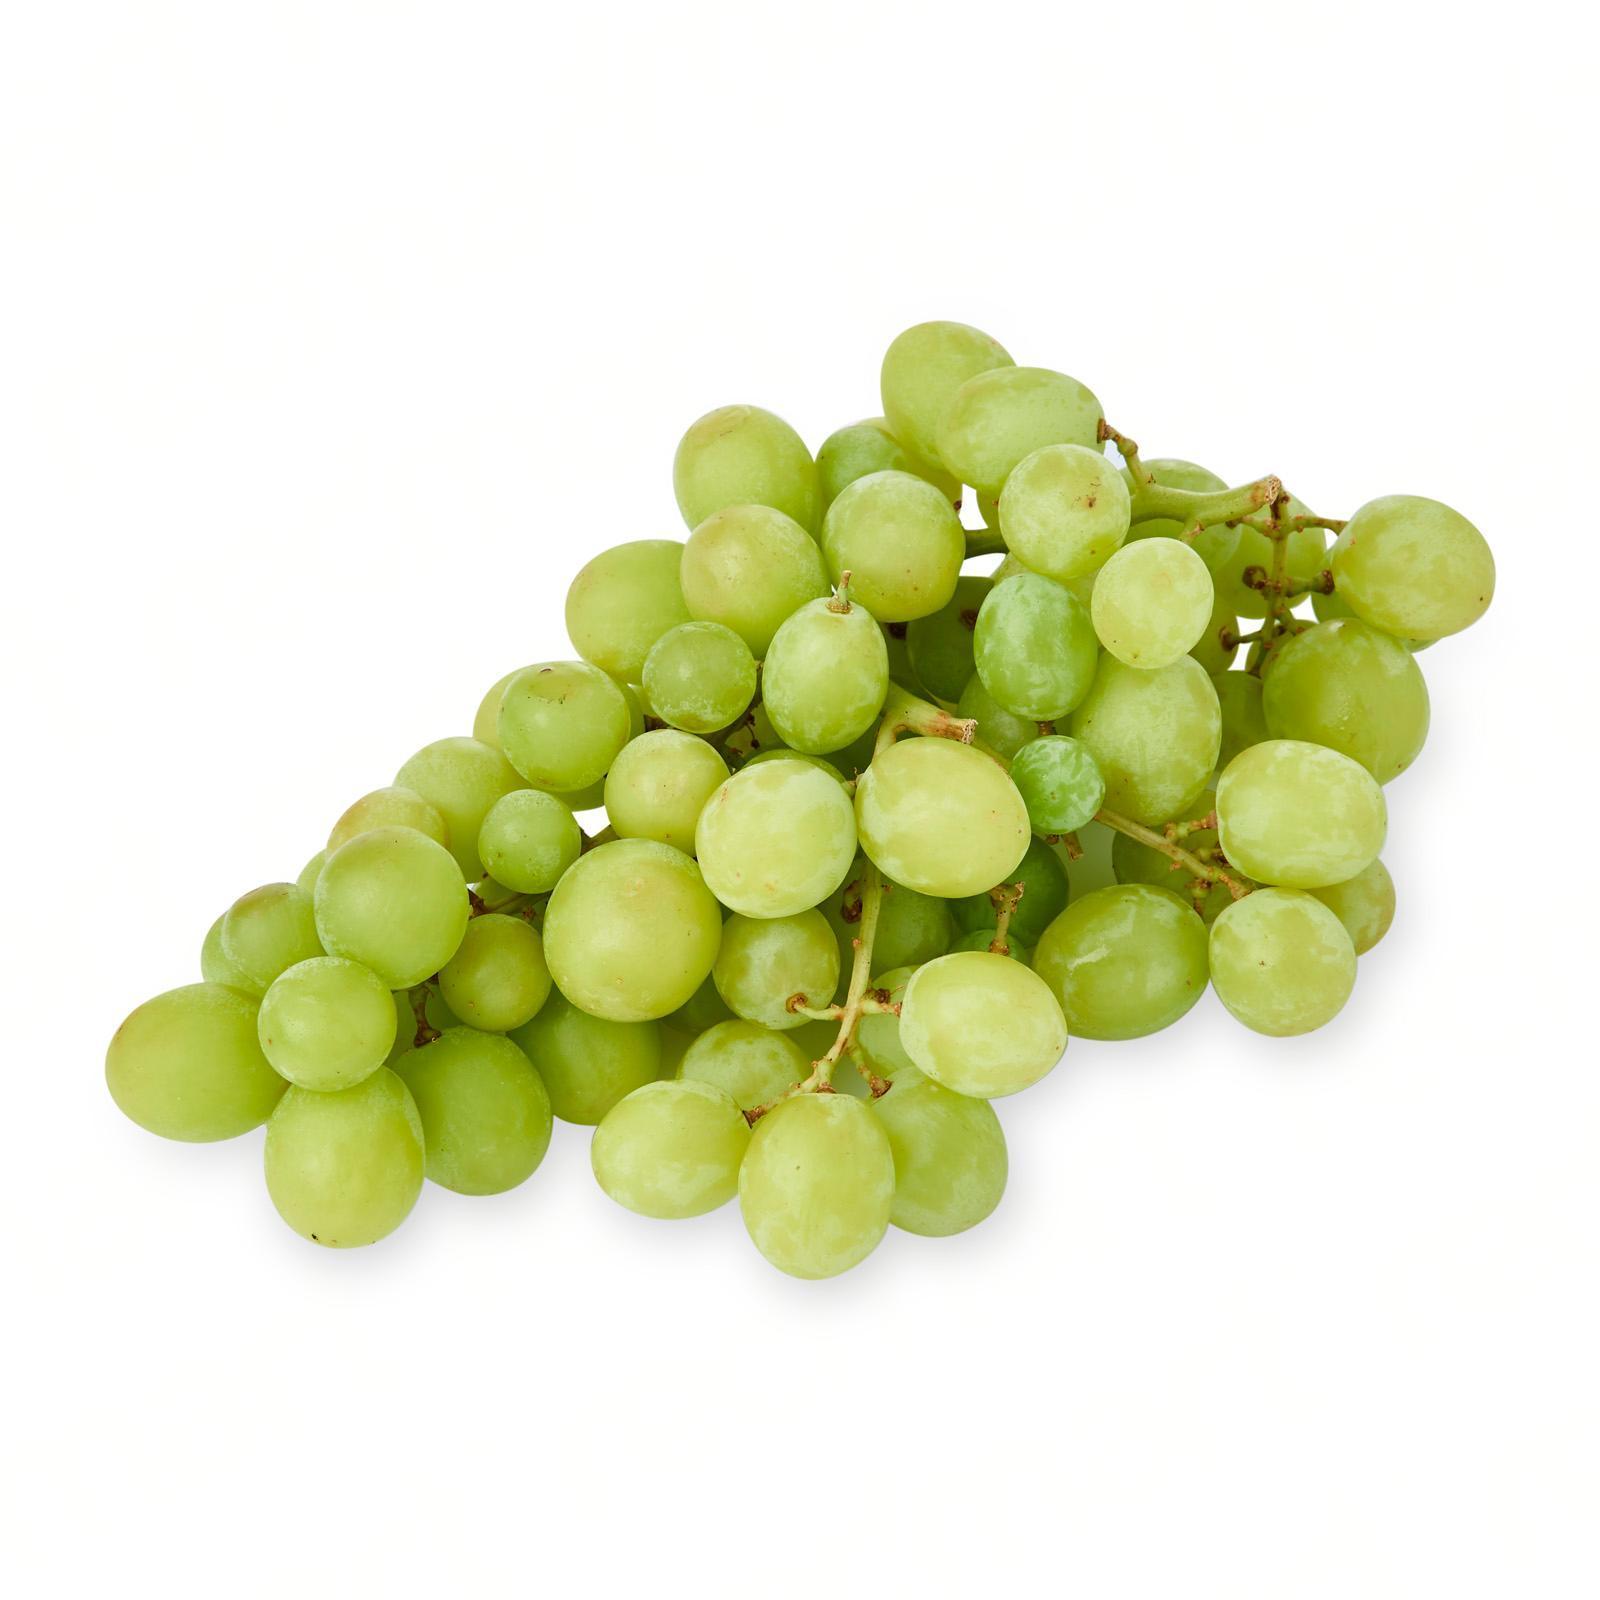 Green Seedless Grapes